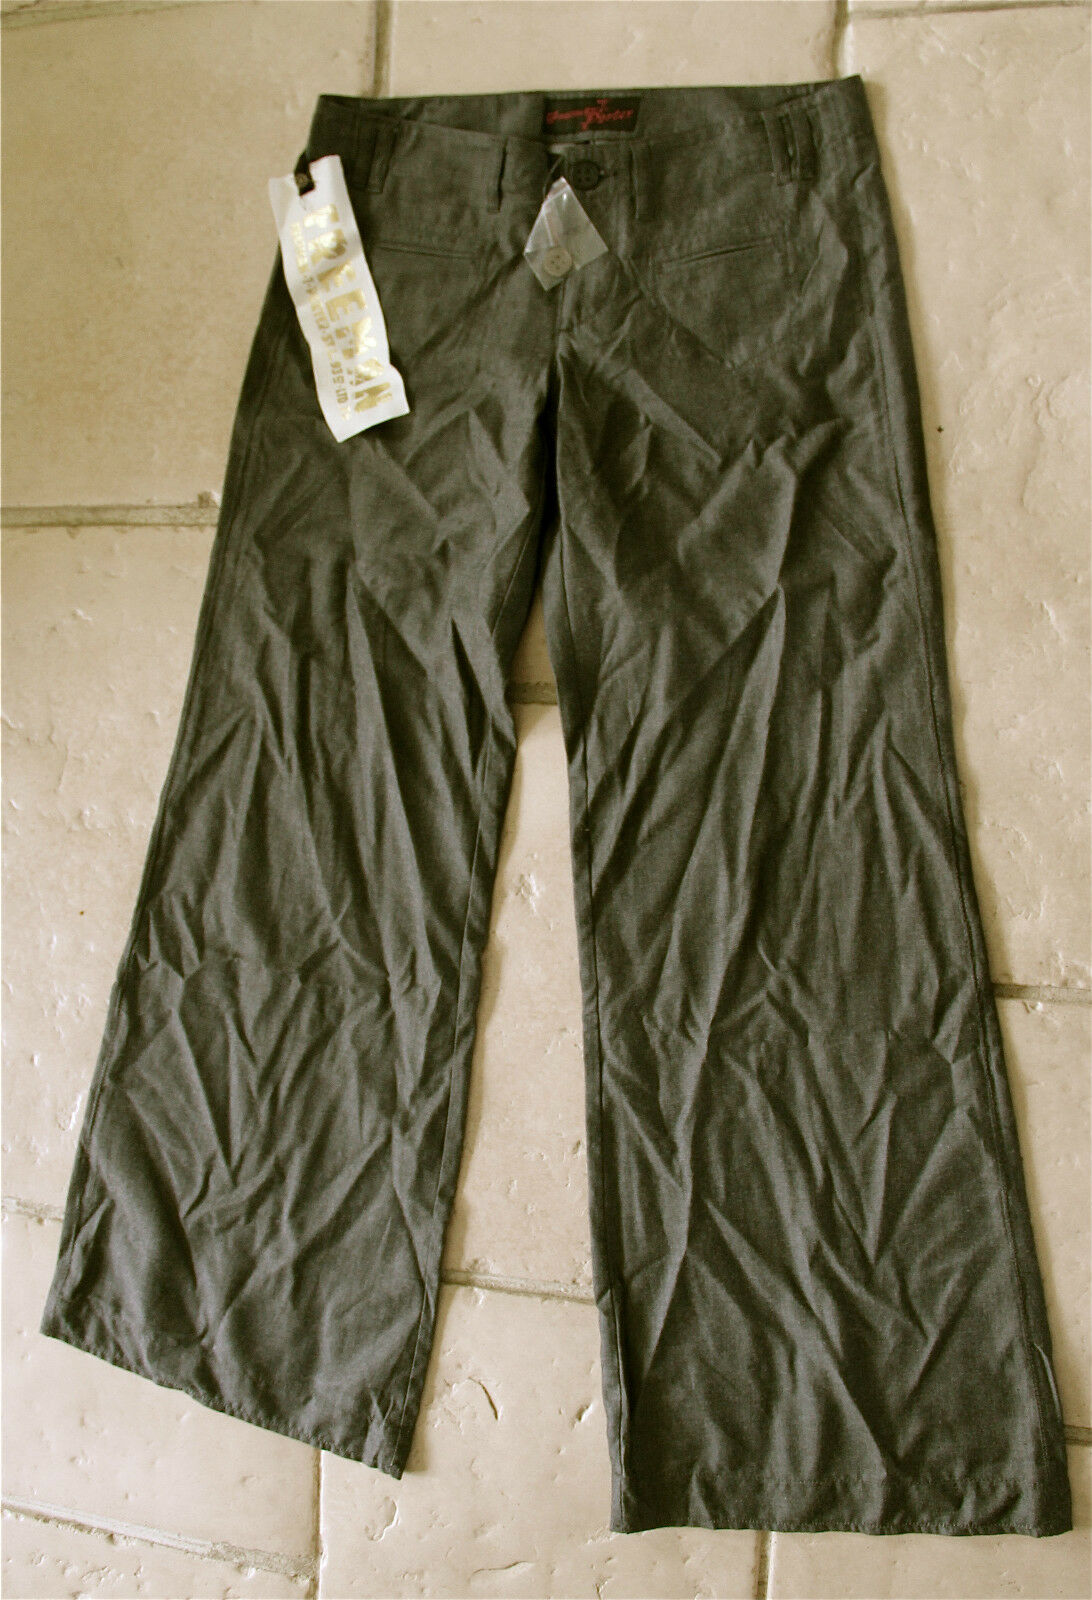 Pantalon size basse large FREEMAN T PORTER jama size 30 (40) NEUF ÉTIQUETTE